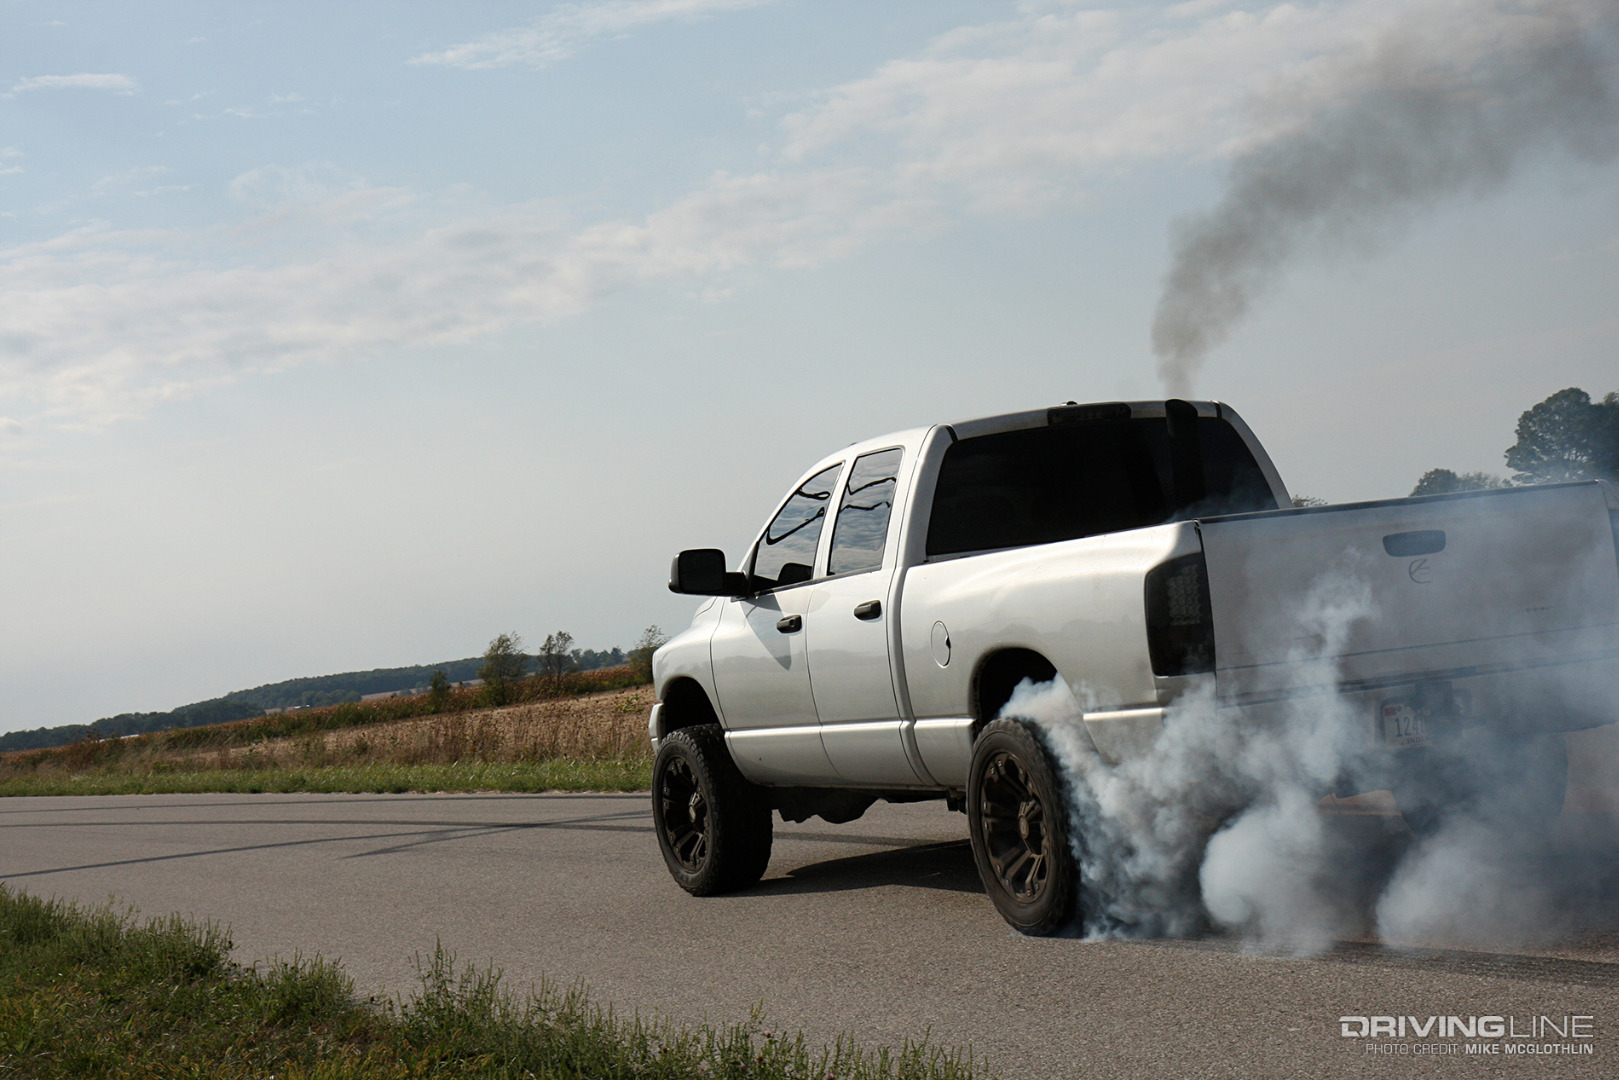 diesel trucks burnout dodge cummins ram 2500 2006 transmissions torque automatic management drivingline